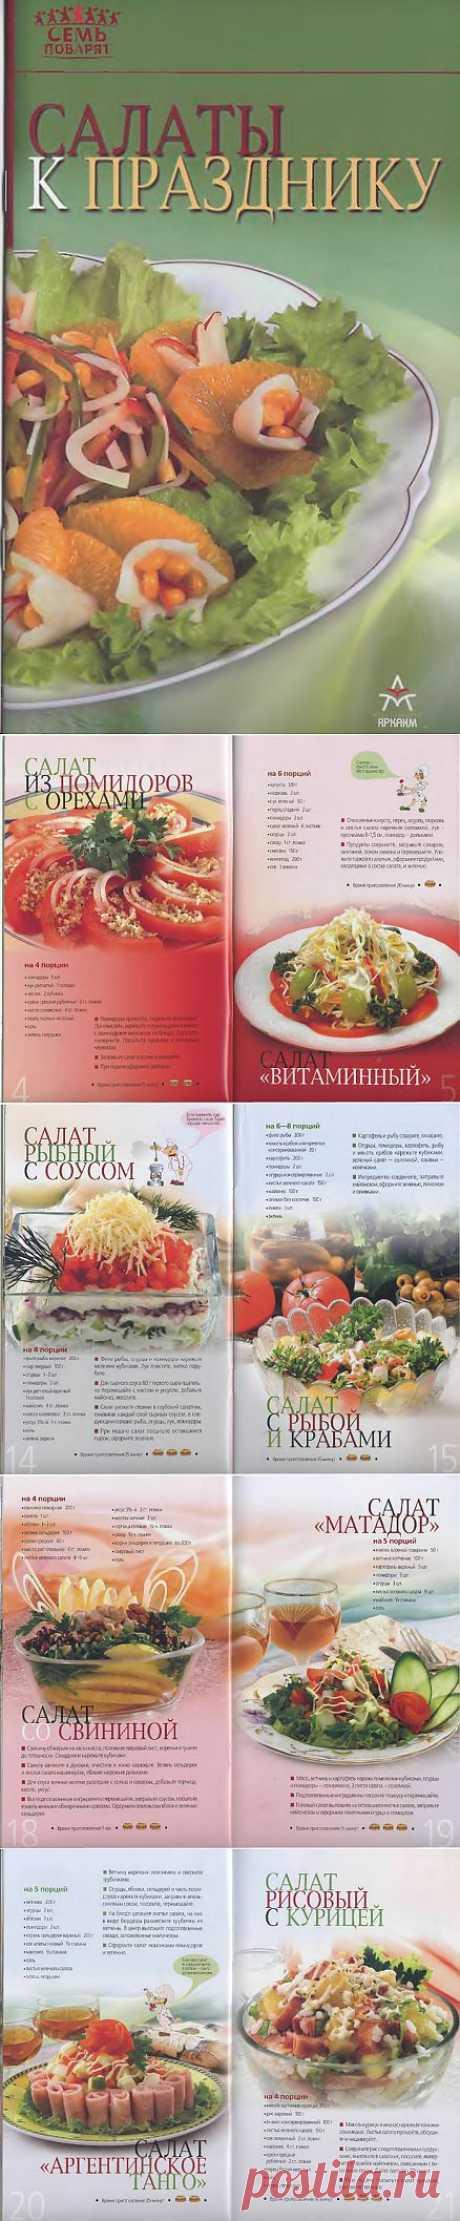 """Салаты к празднику"". Журнал по кулинарии."